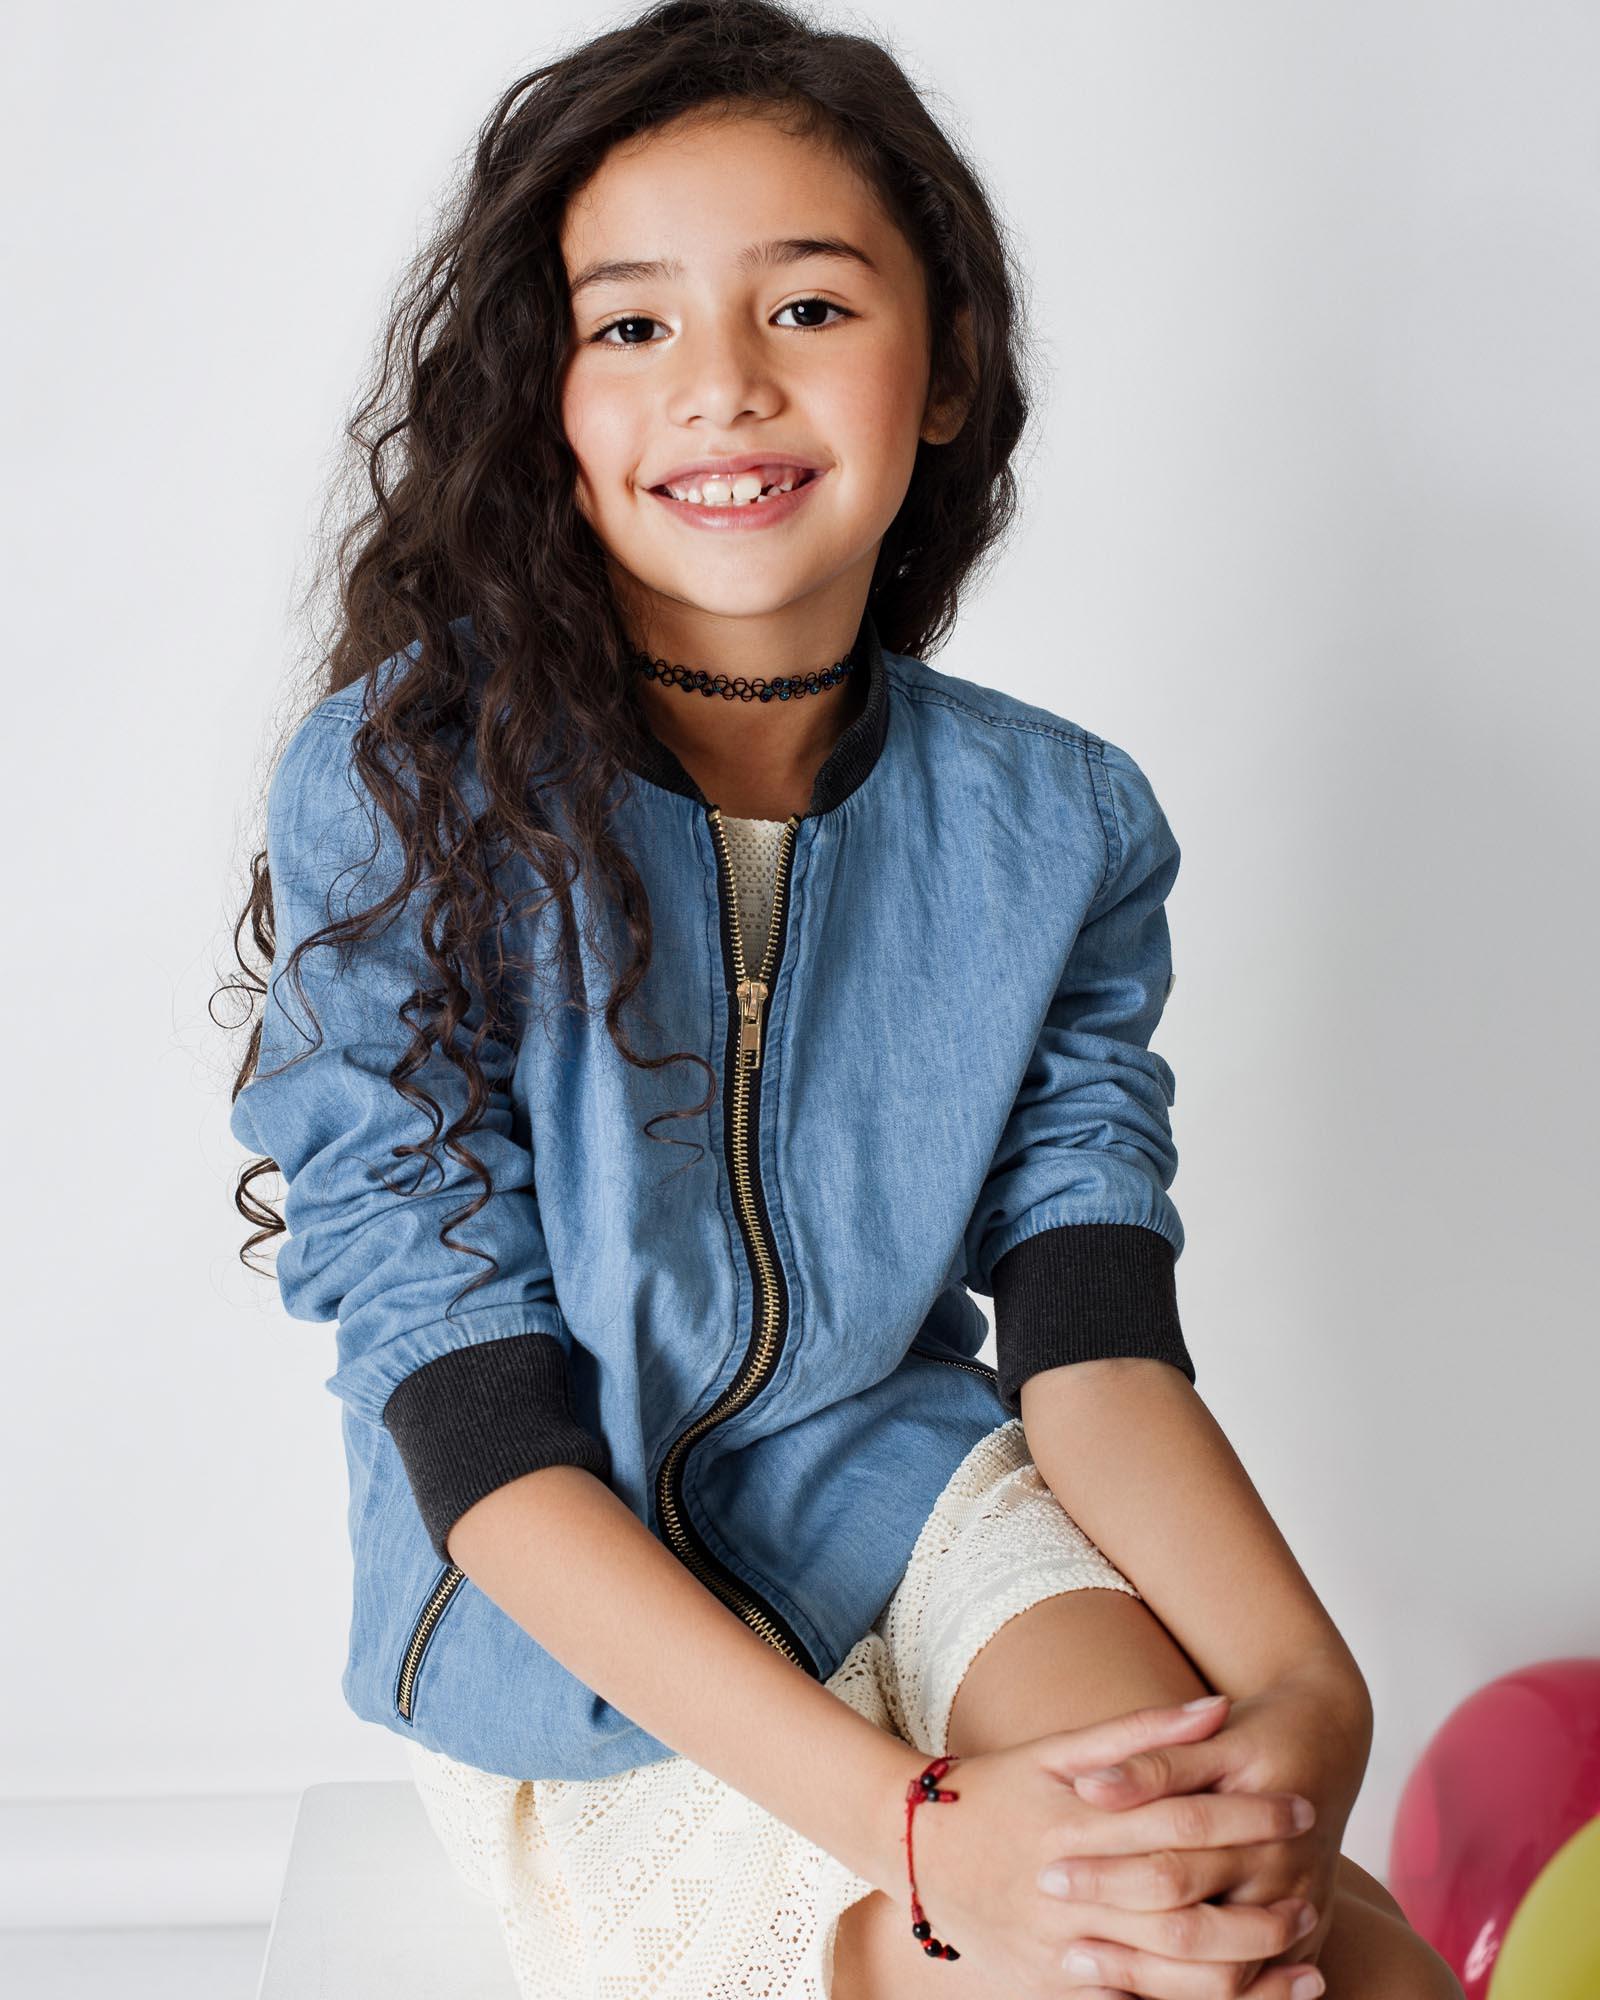 nyc-photographers-kids-modeling-10008.jpg